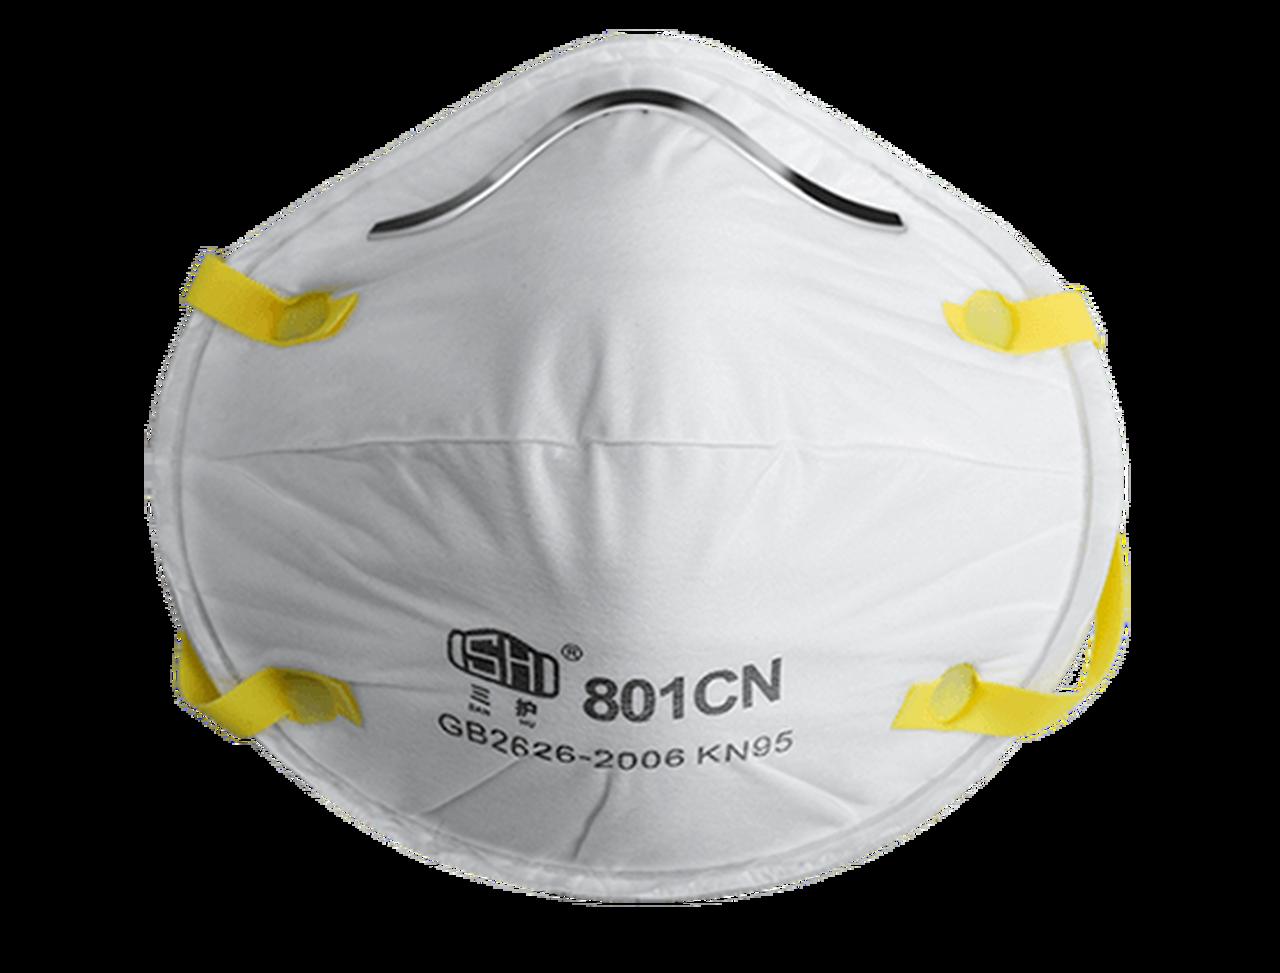 Head Straps Mask KN95 – FFP2 – SH 801CN Conical - $1.80 PC